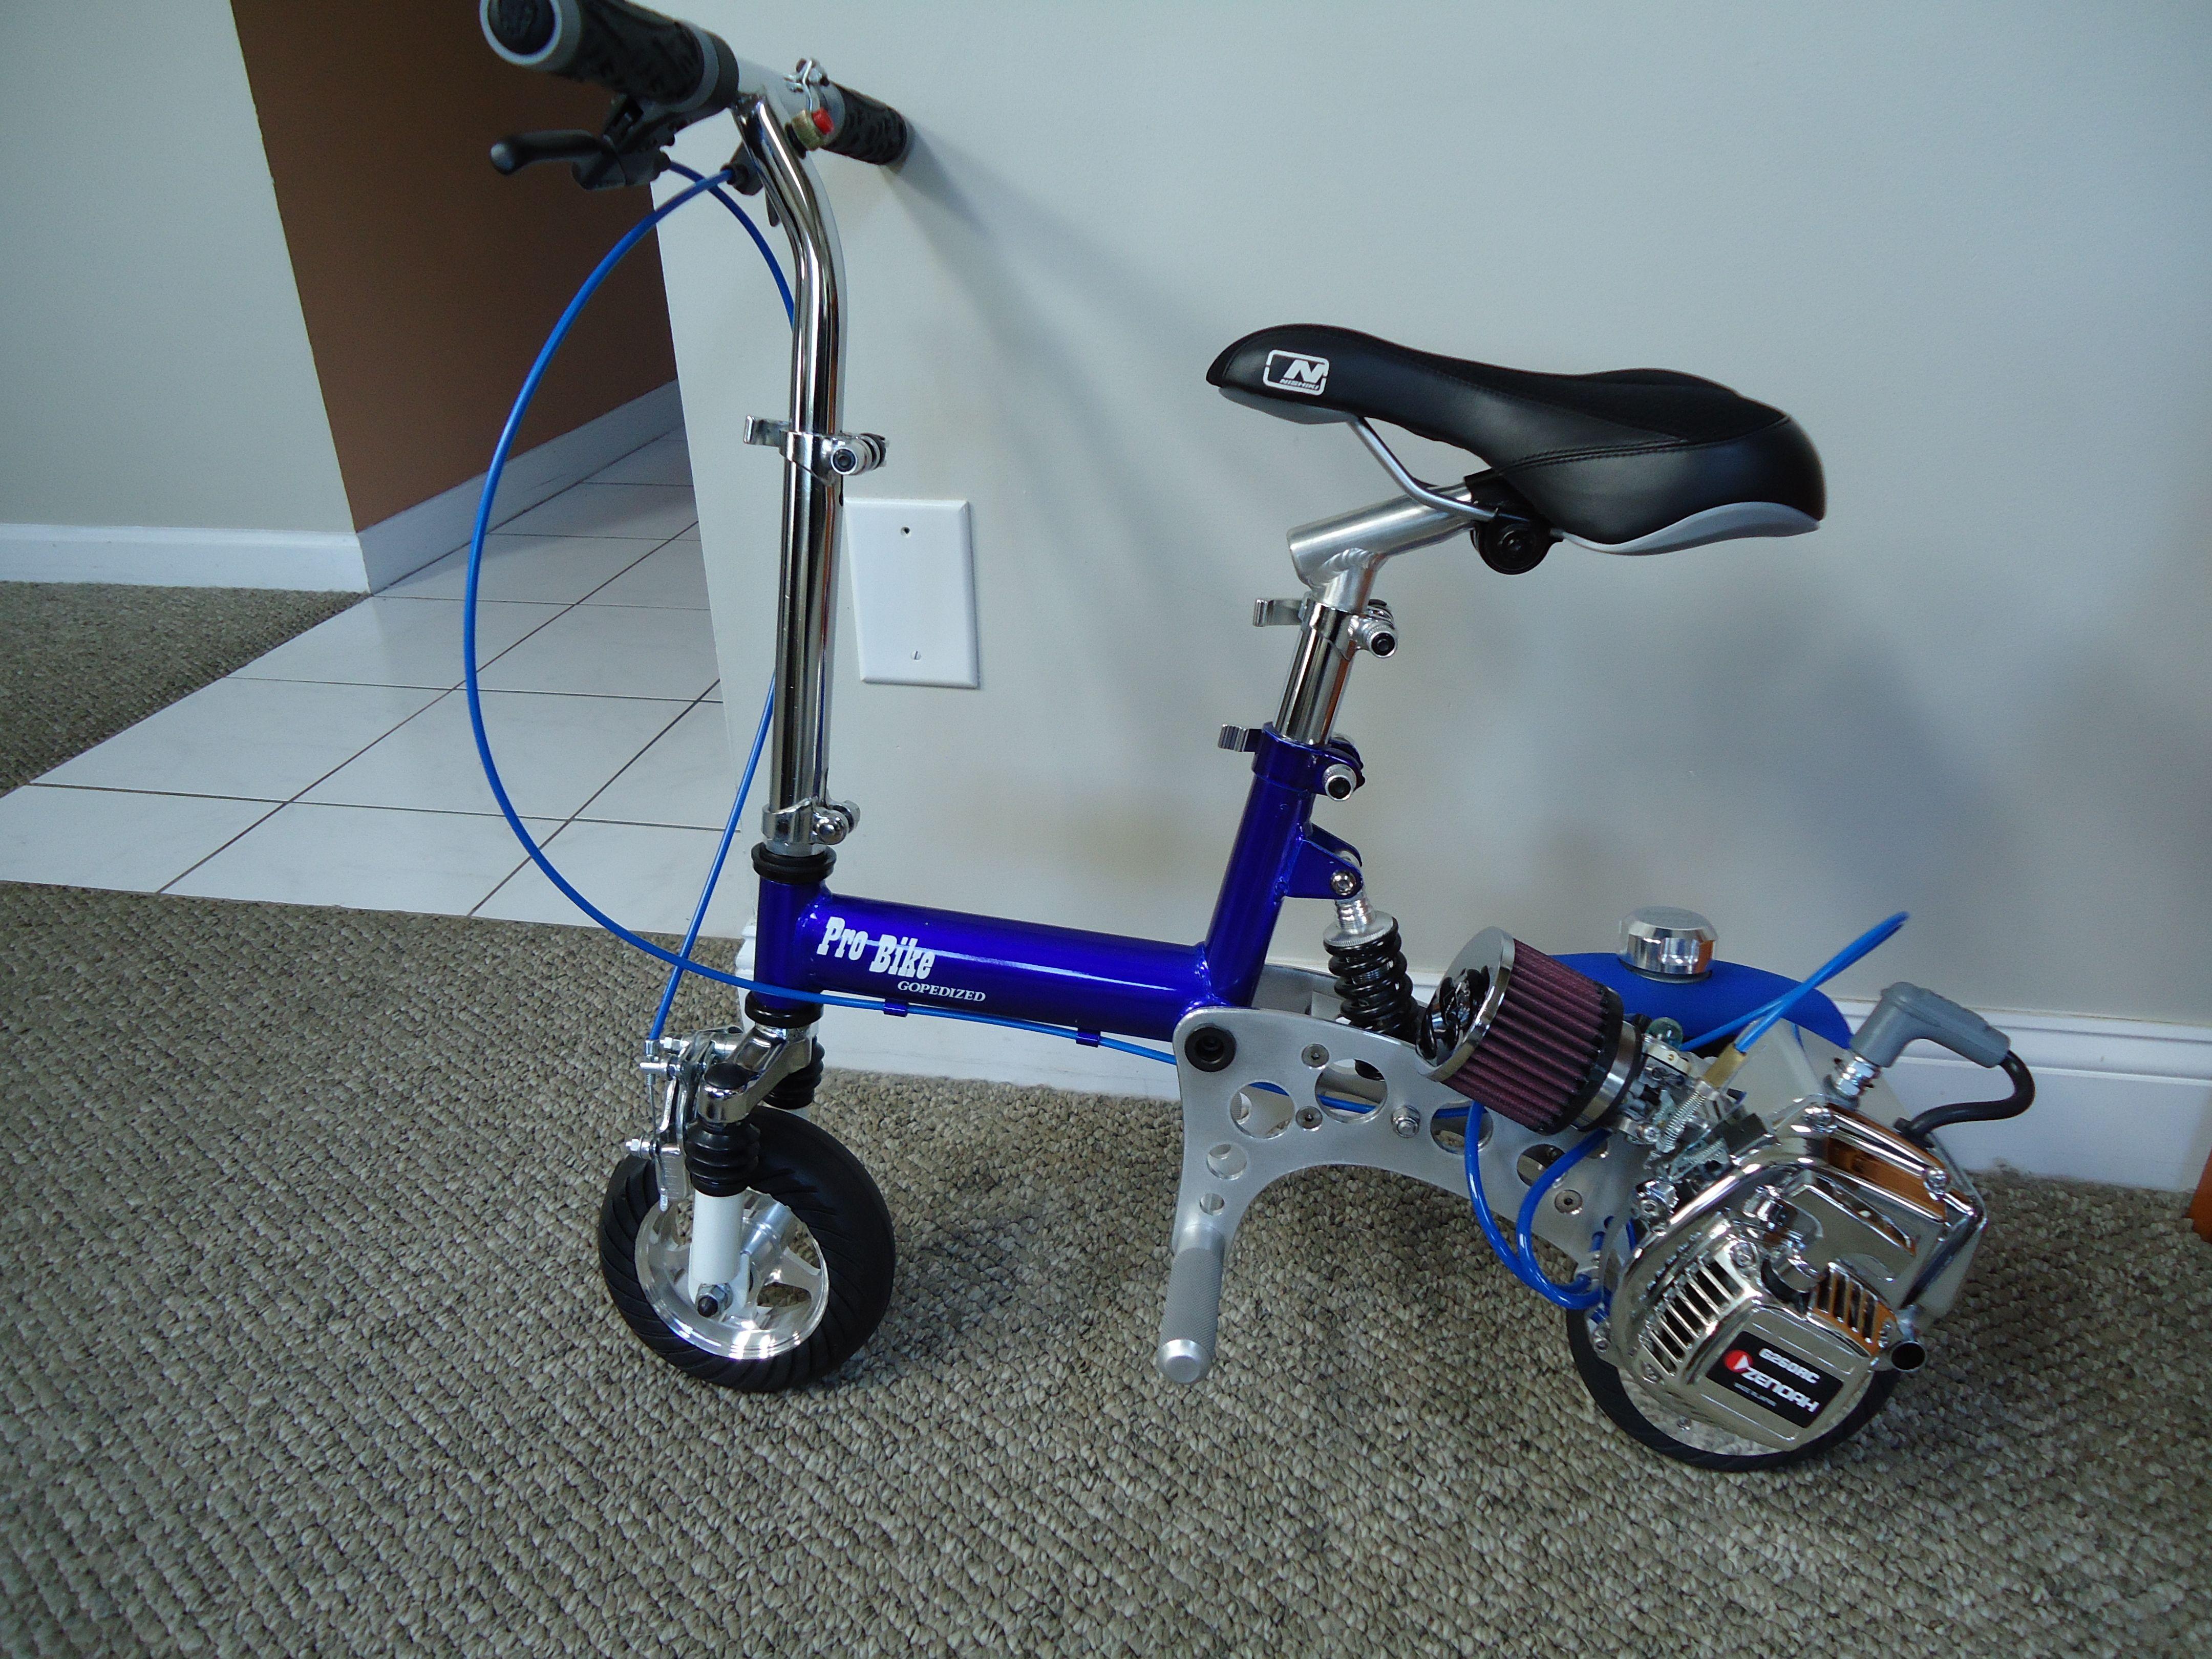 Scooter Pro S Pro Bike Goped Pinterest Pro Bike Scooters